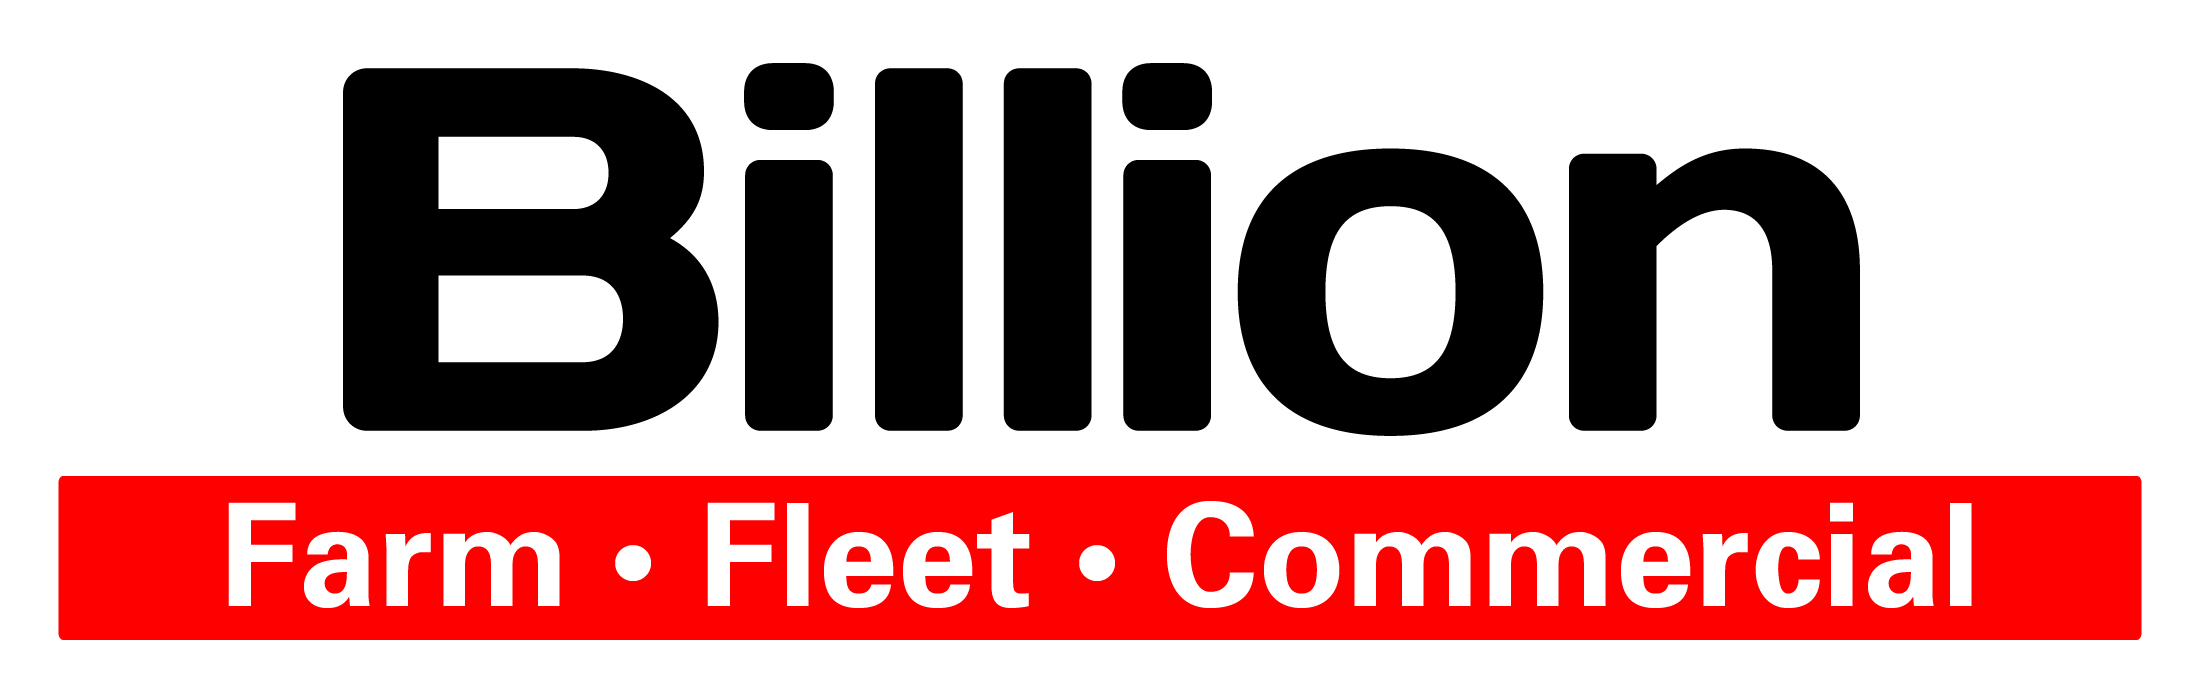 Billion Farm Fleet & Commercial